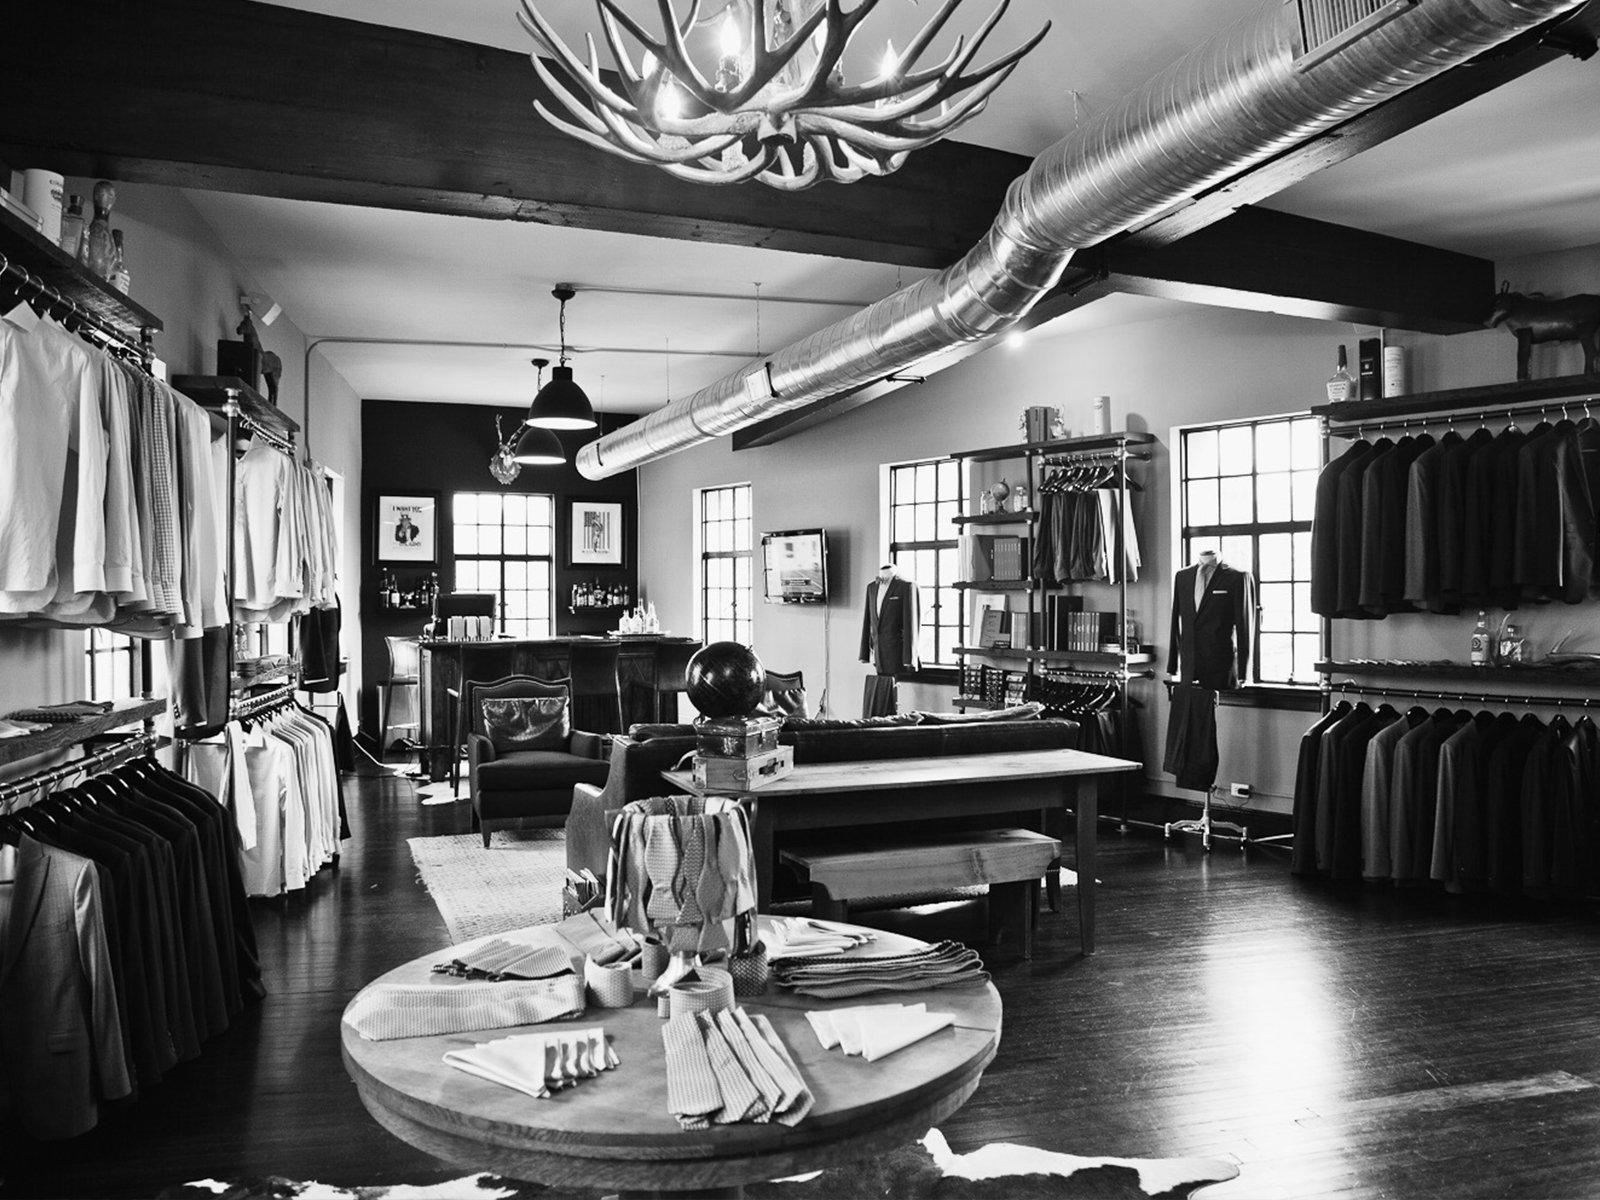 Alton Lane Washington DC, best men's clothing stores in Washington DC